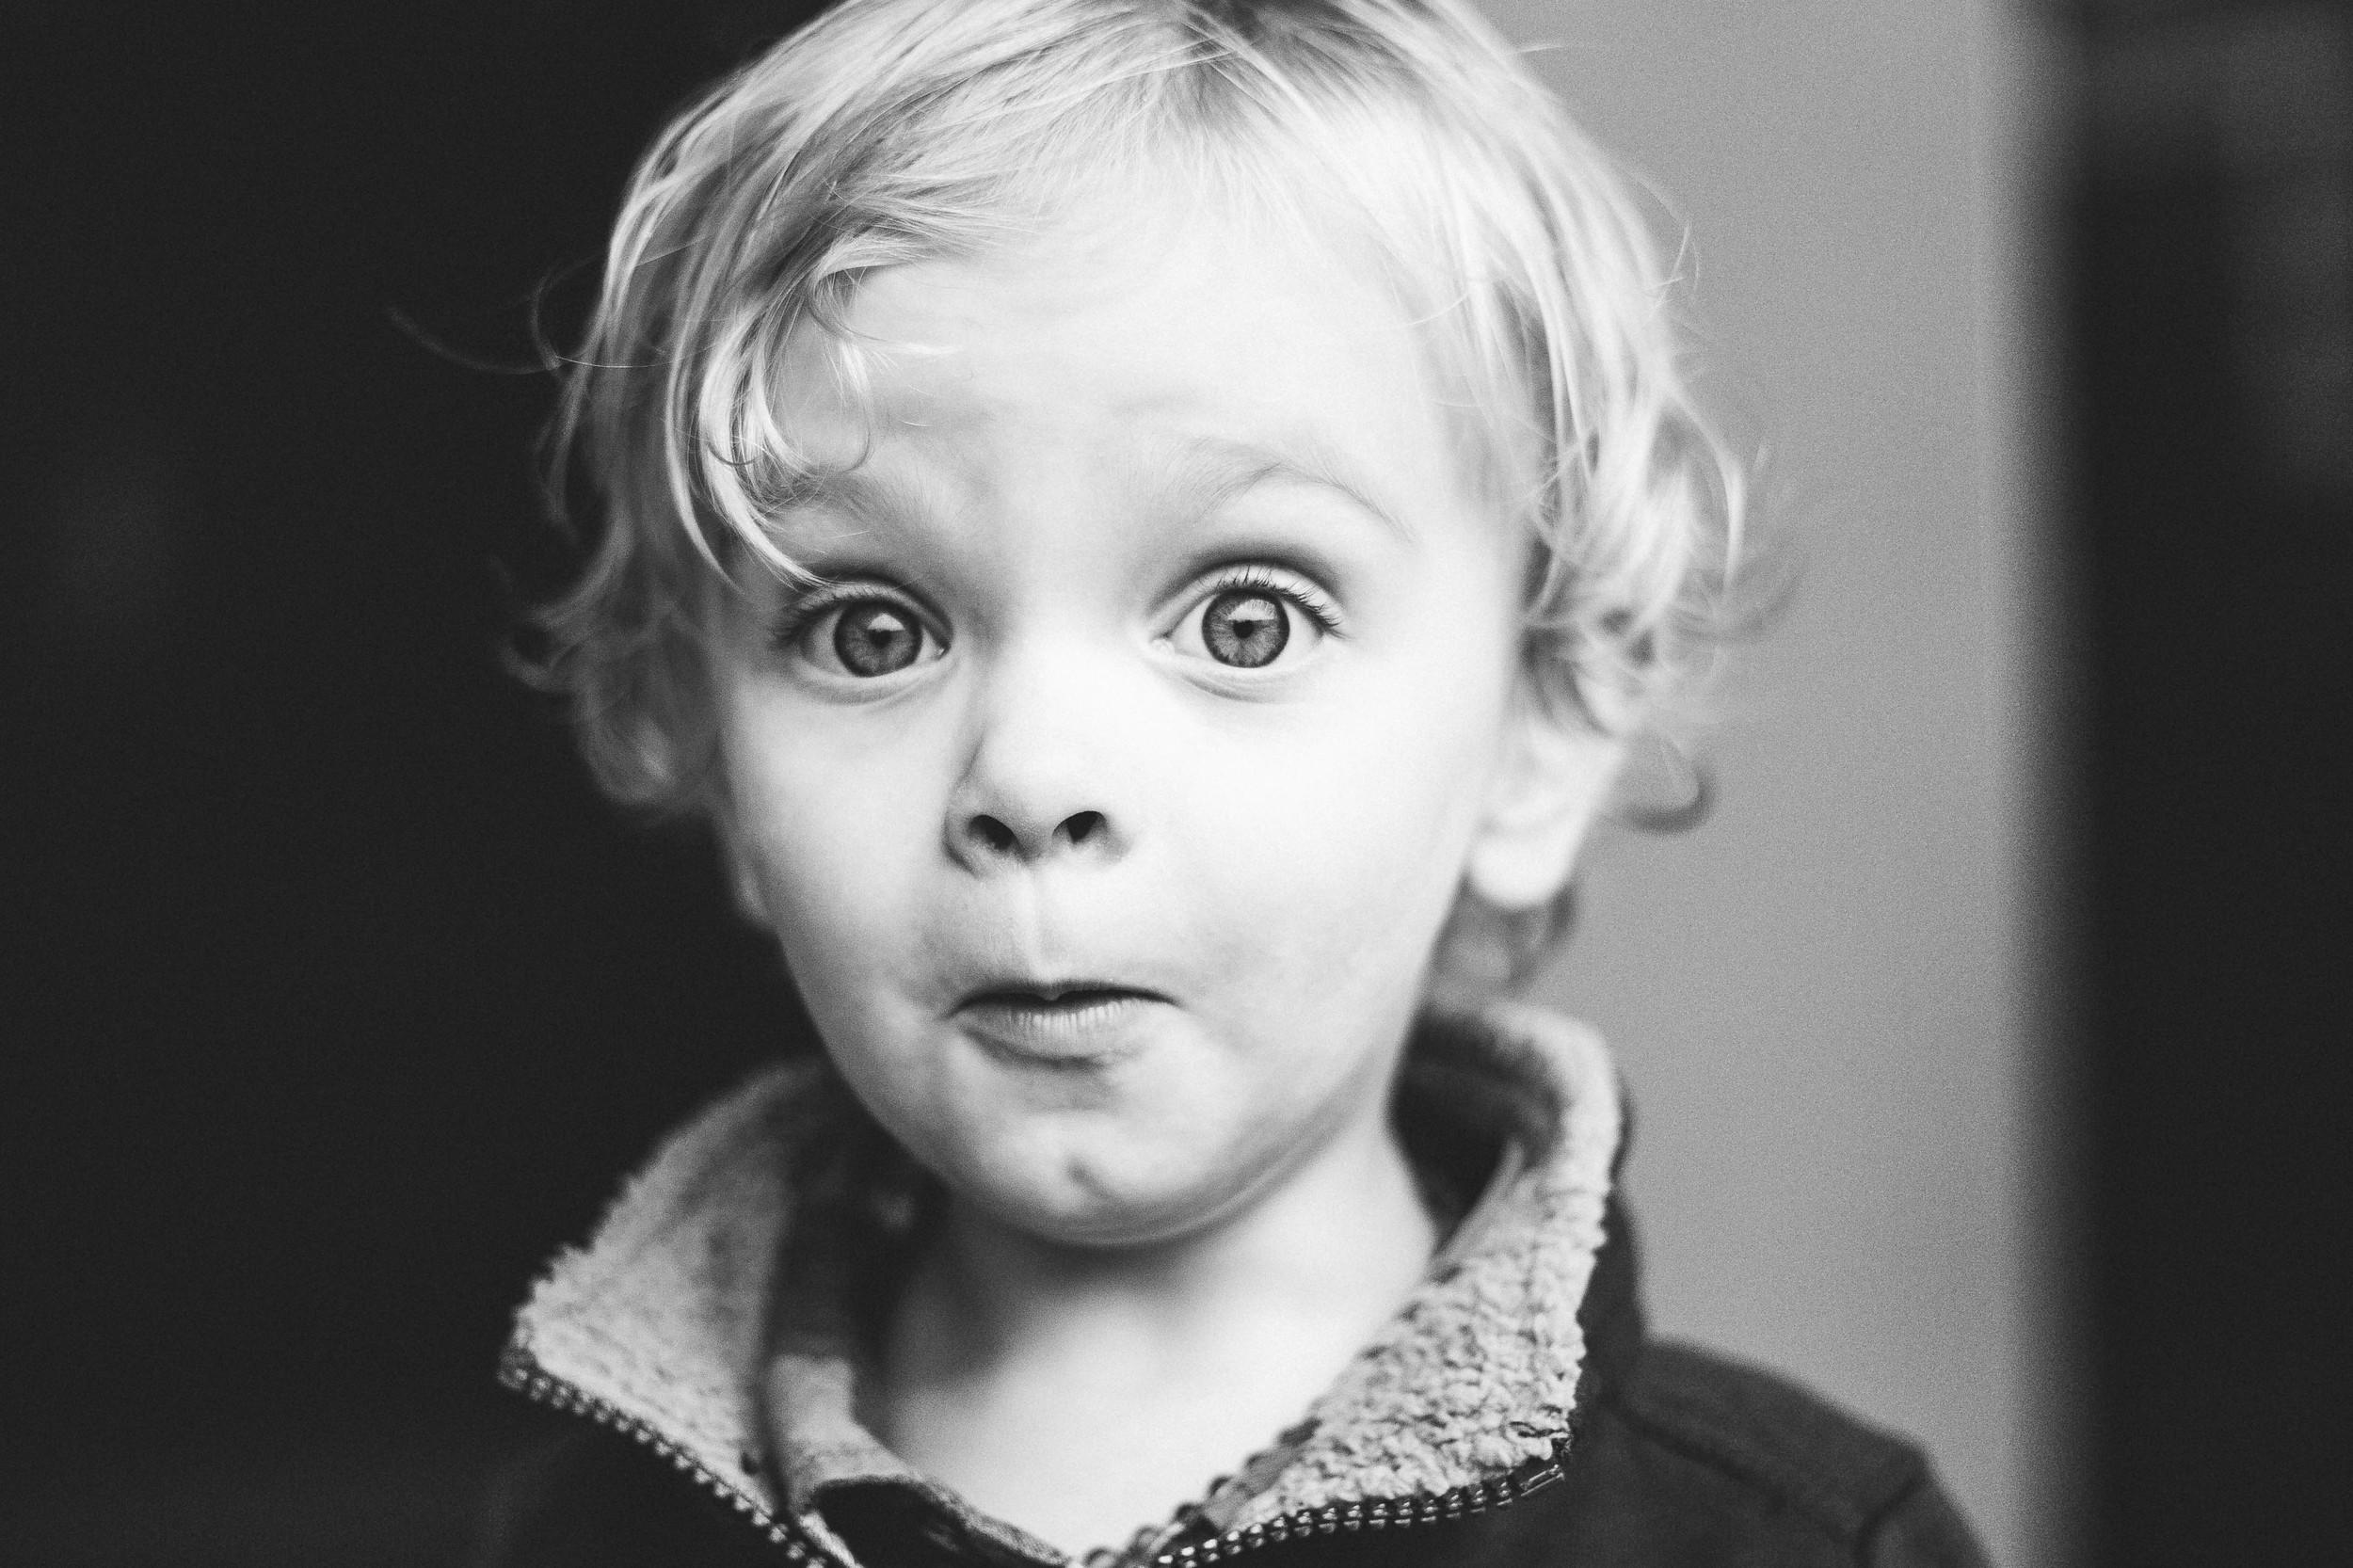 little_boy_surprised